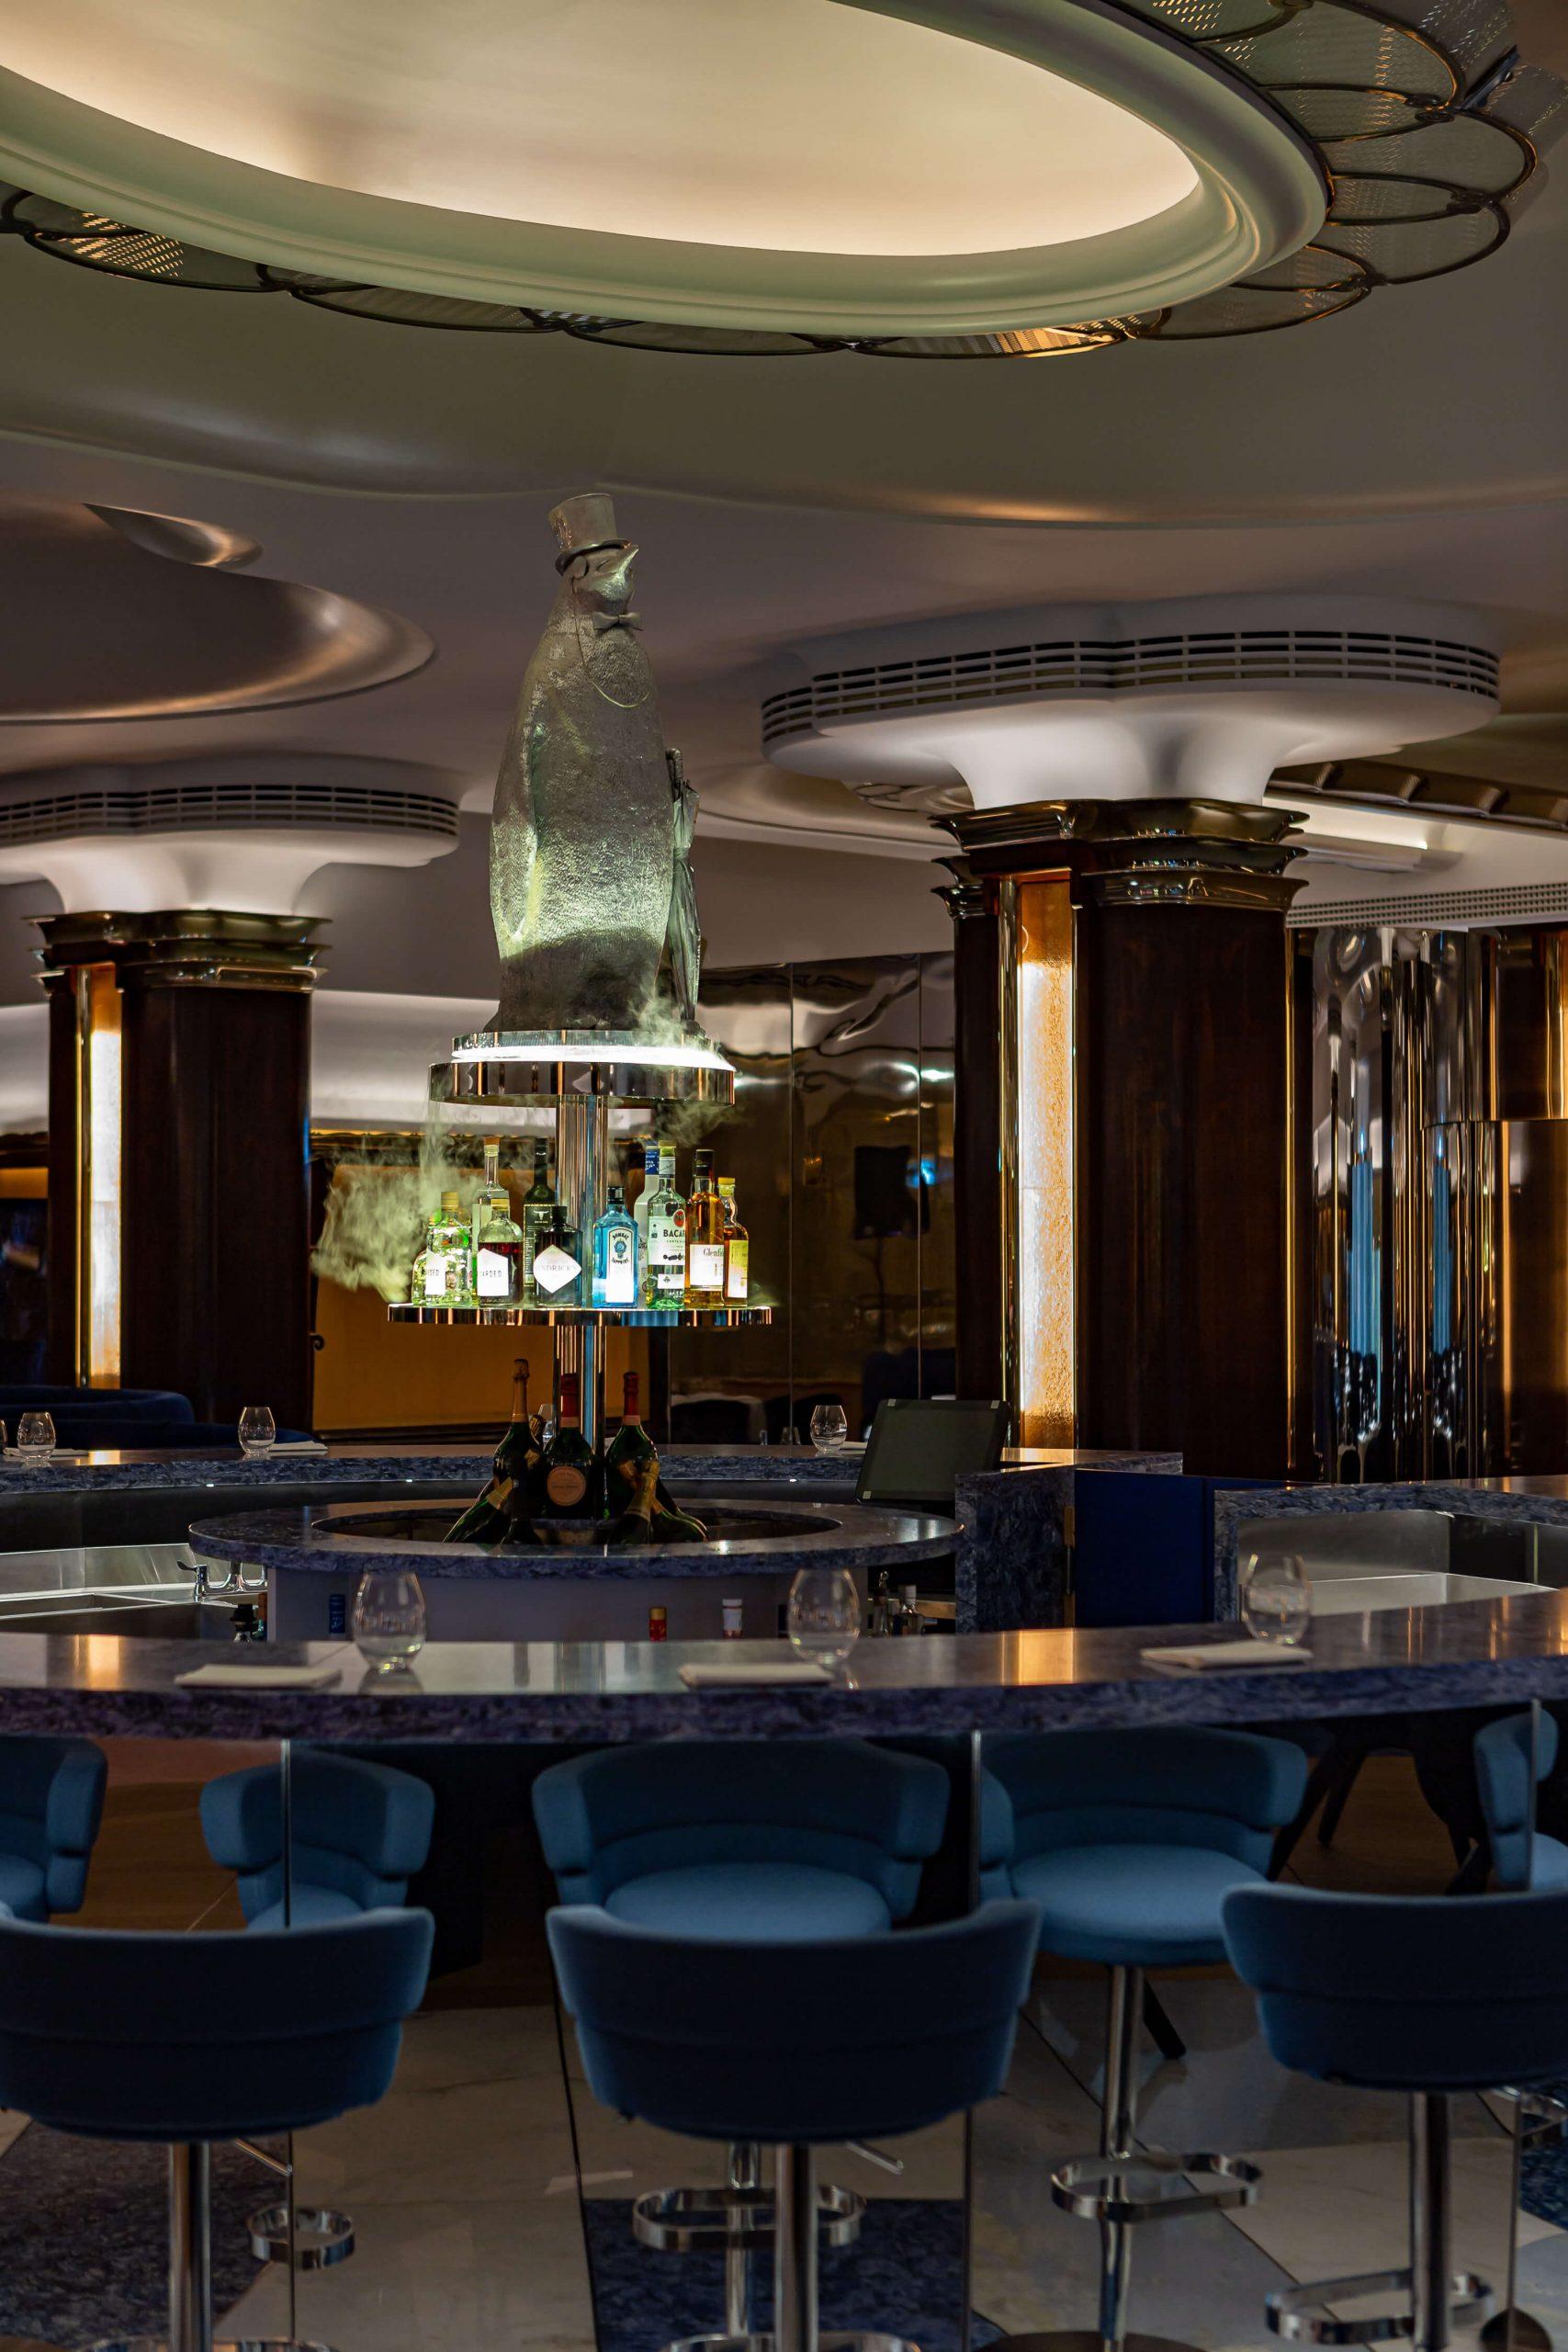 Iceberg Lounge Park Row London